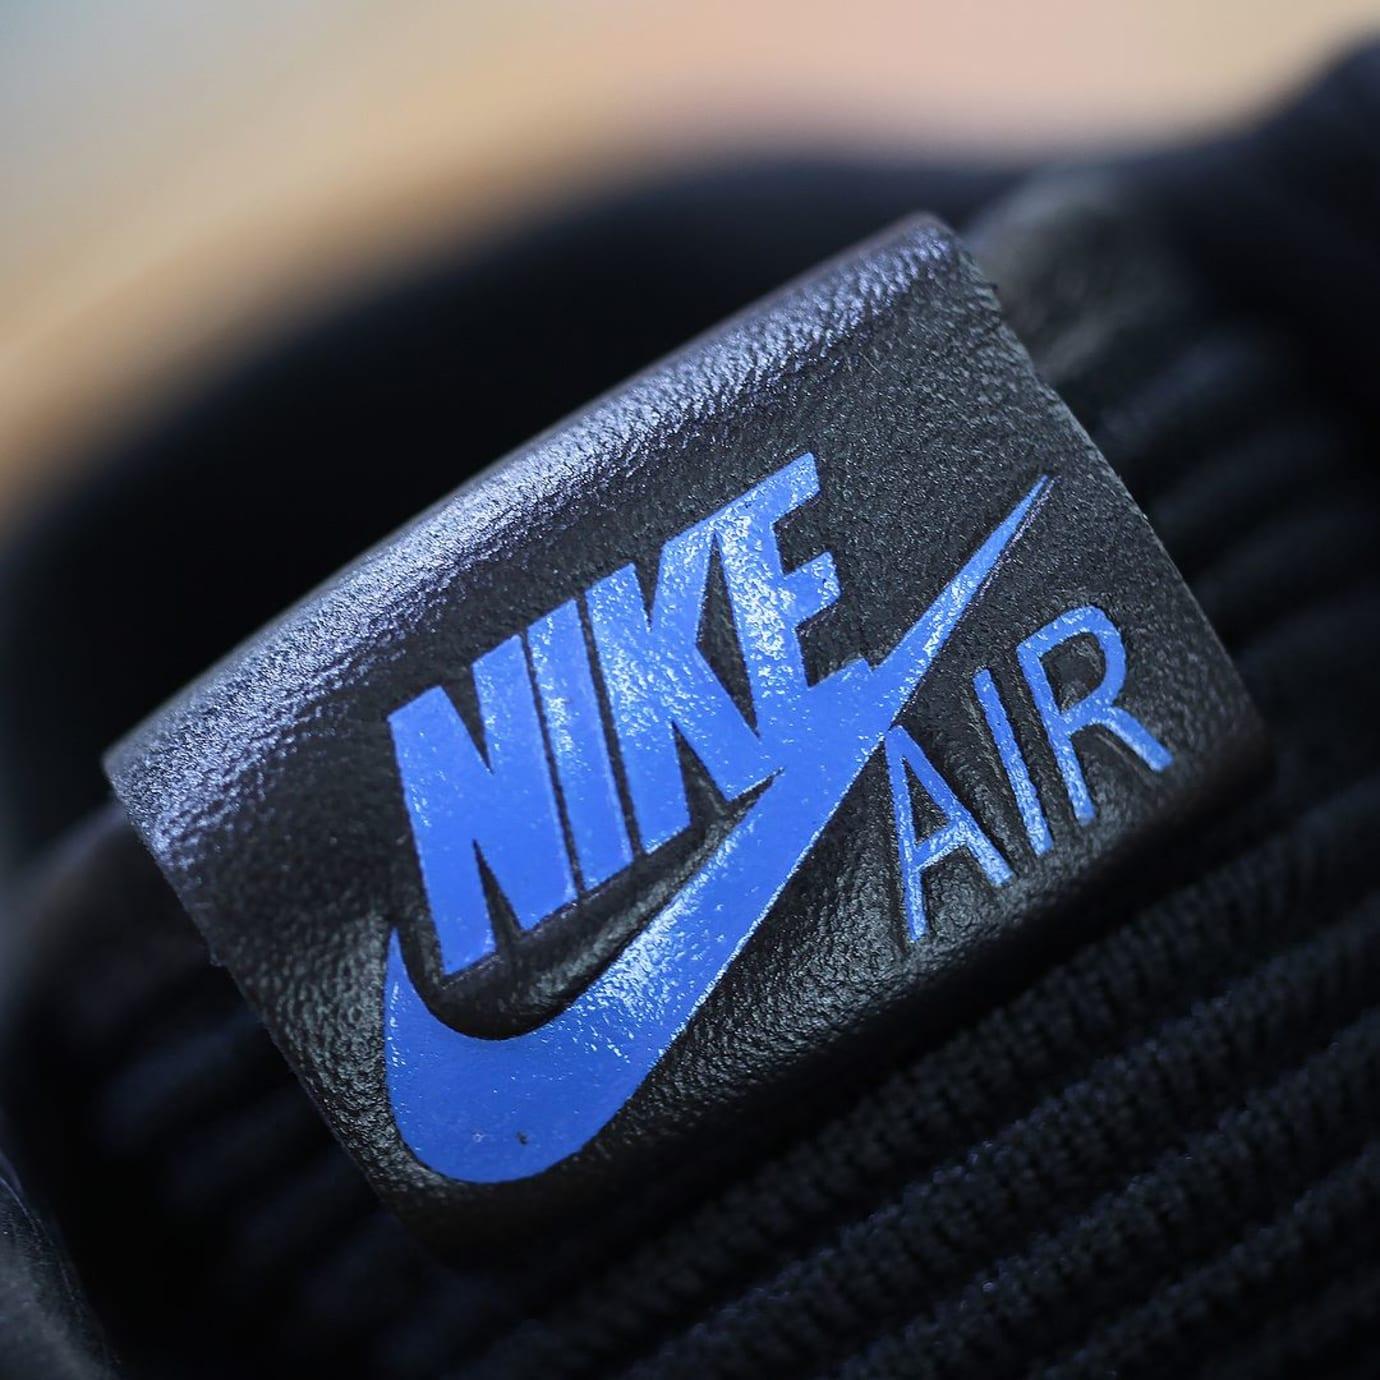 Air Jordan 1 Flyknit Royal Release Date 919704-006 (10)